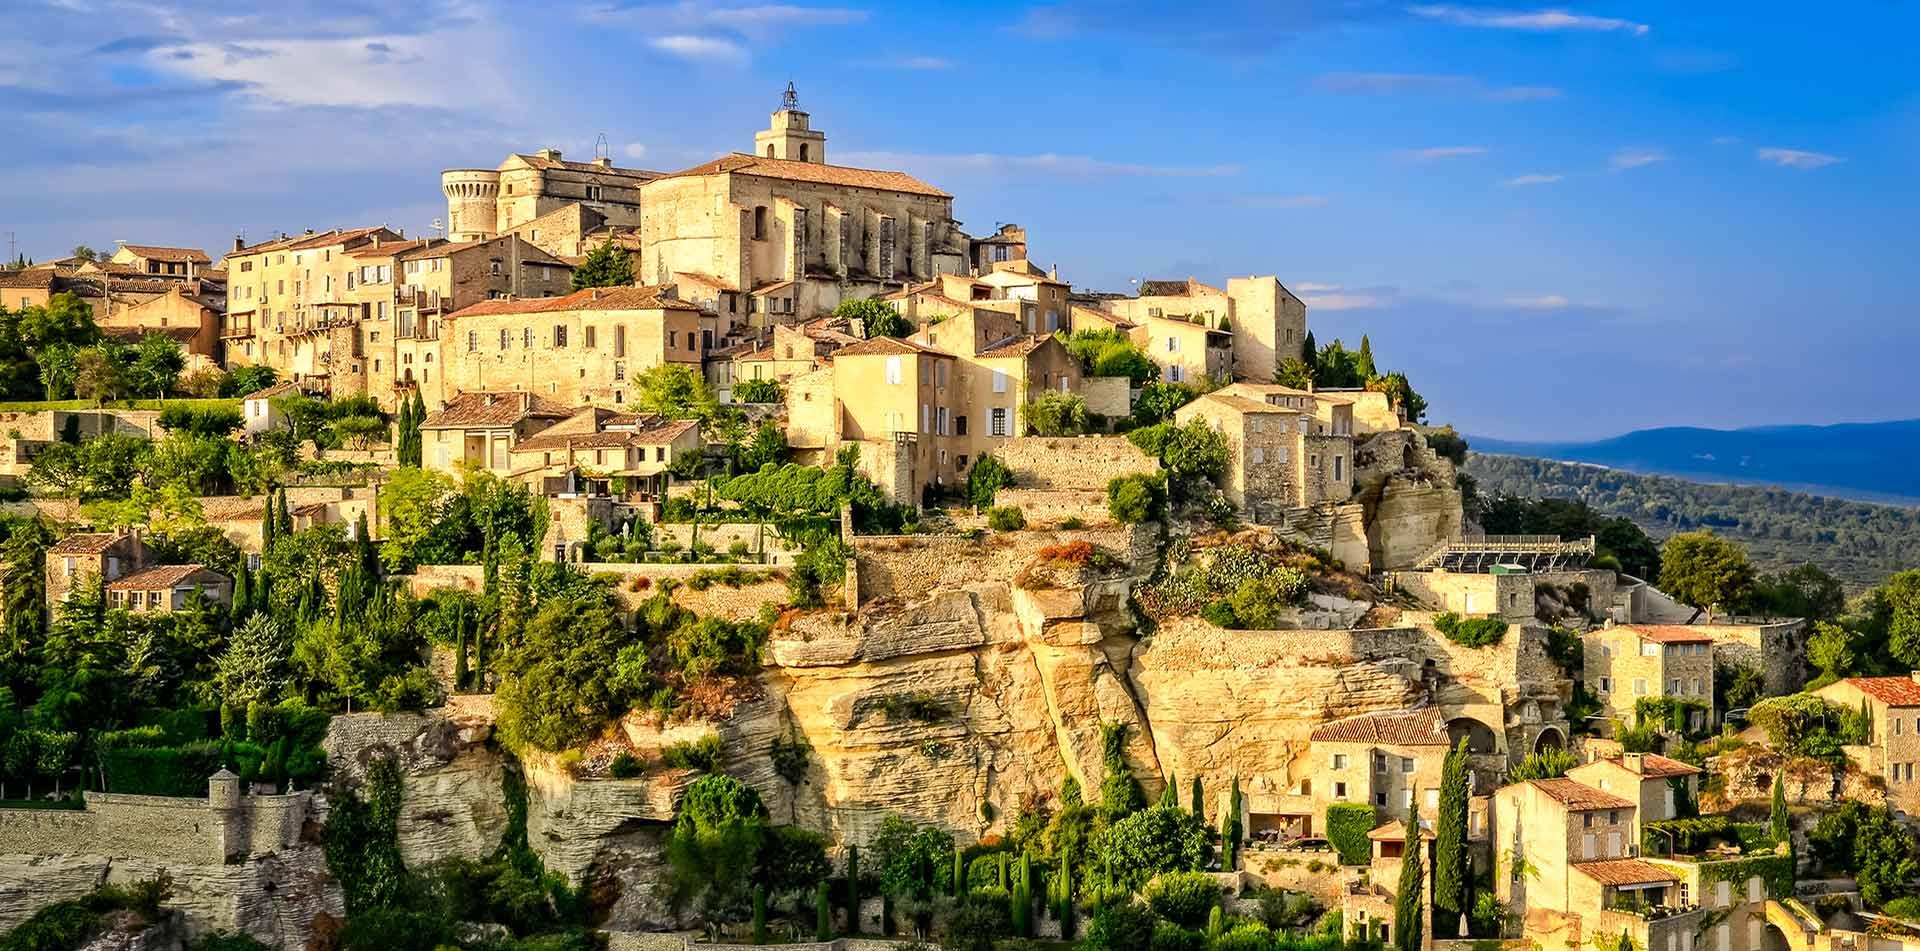 Medieval Village at Sunset in Provence, France